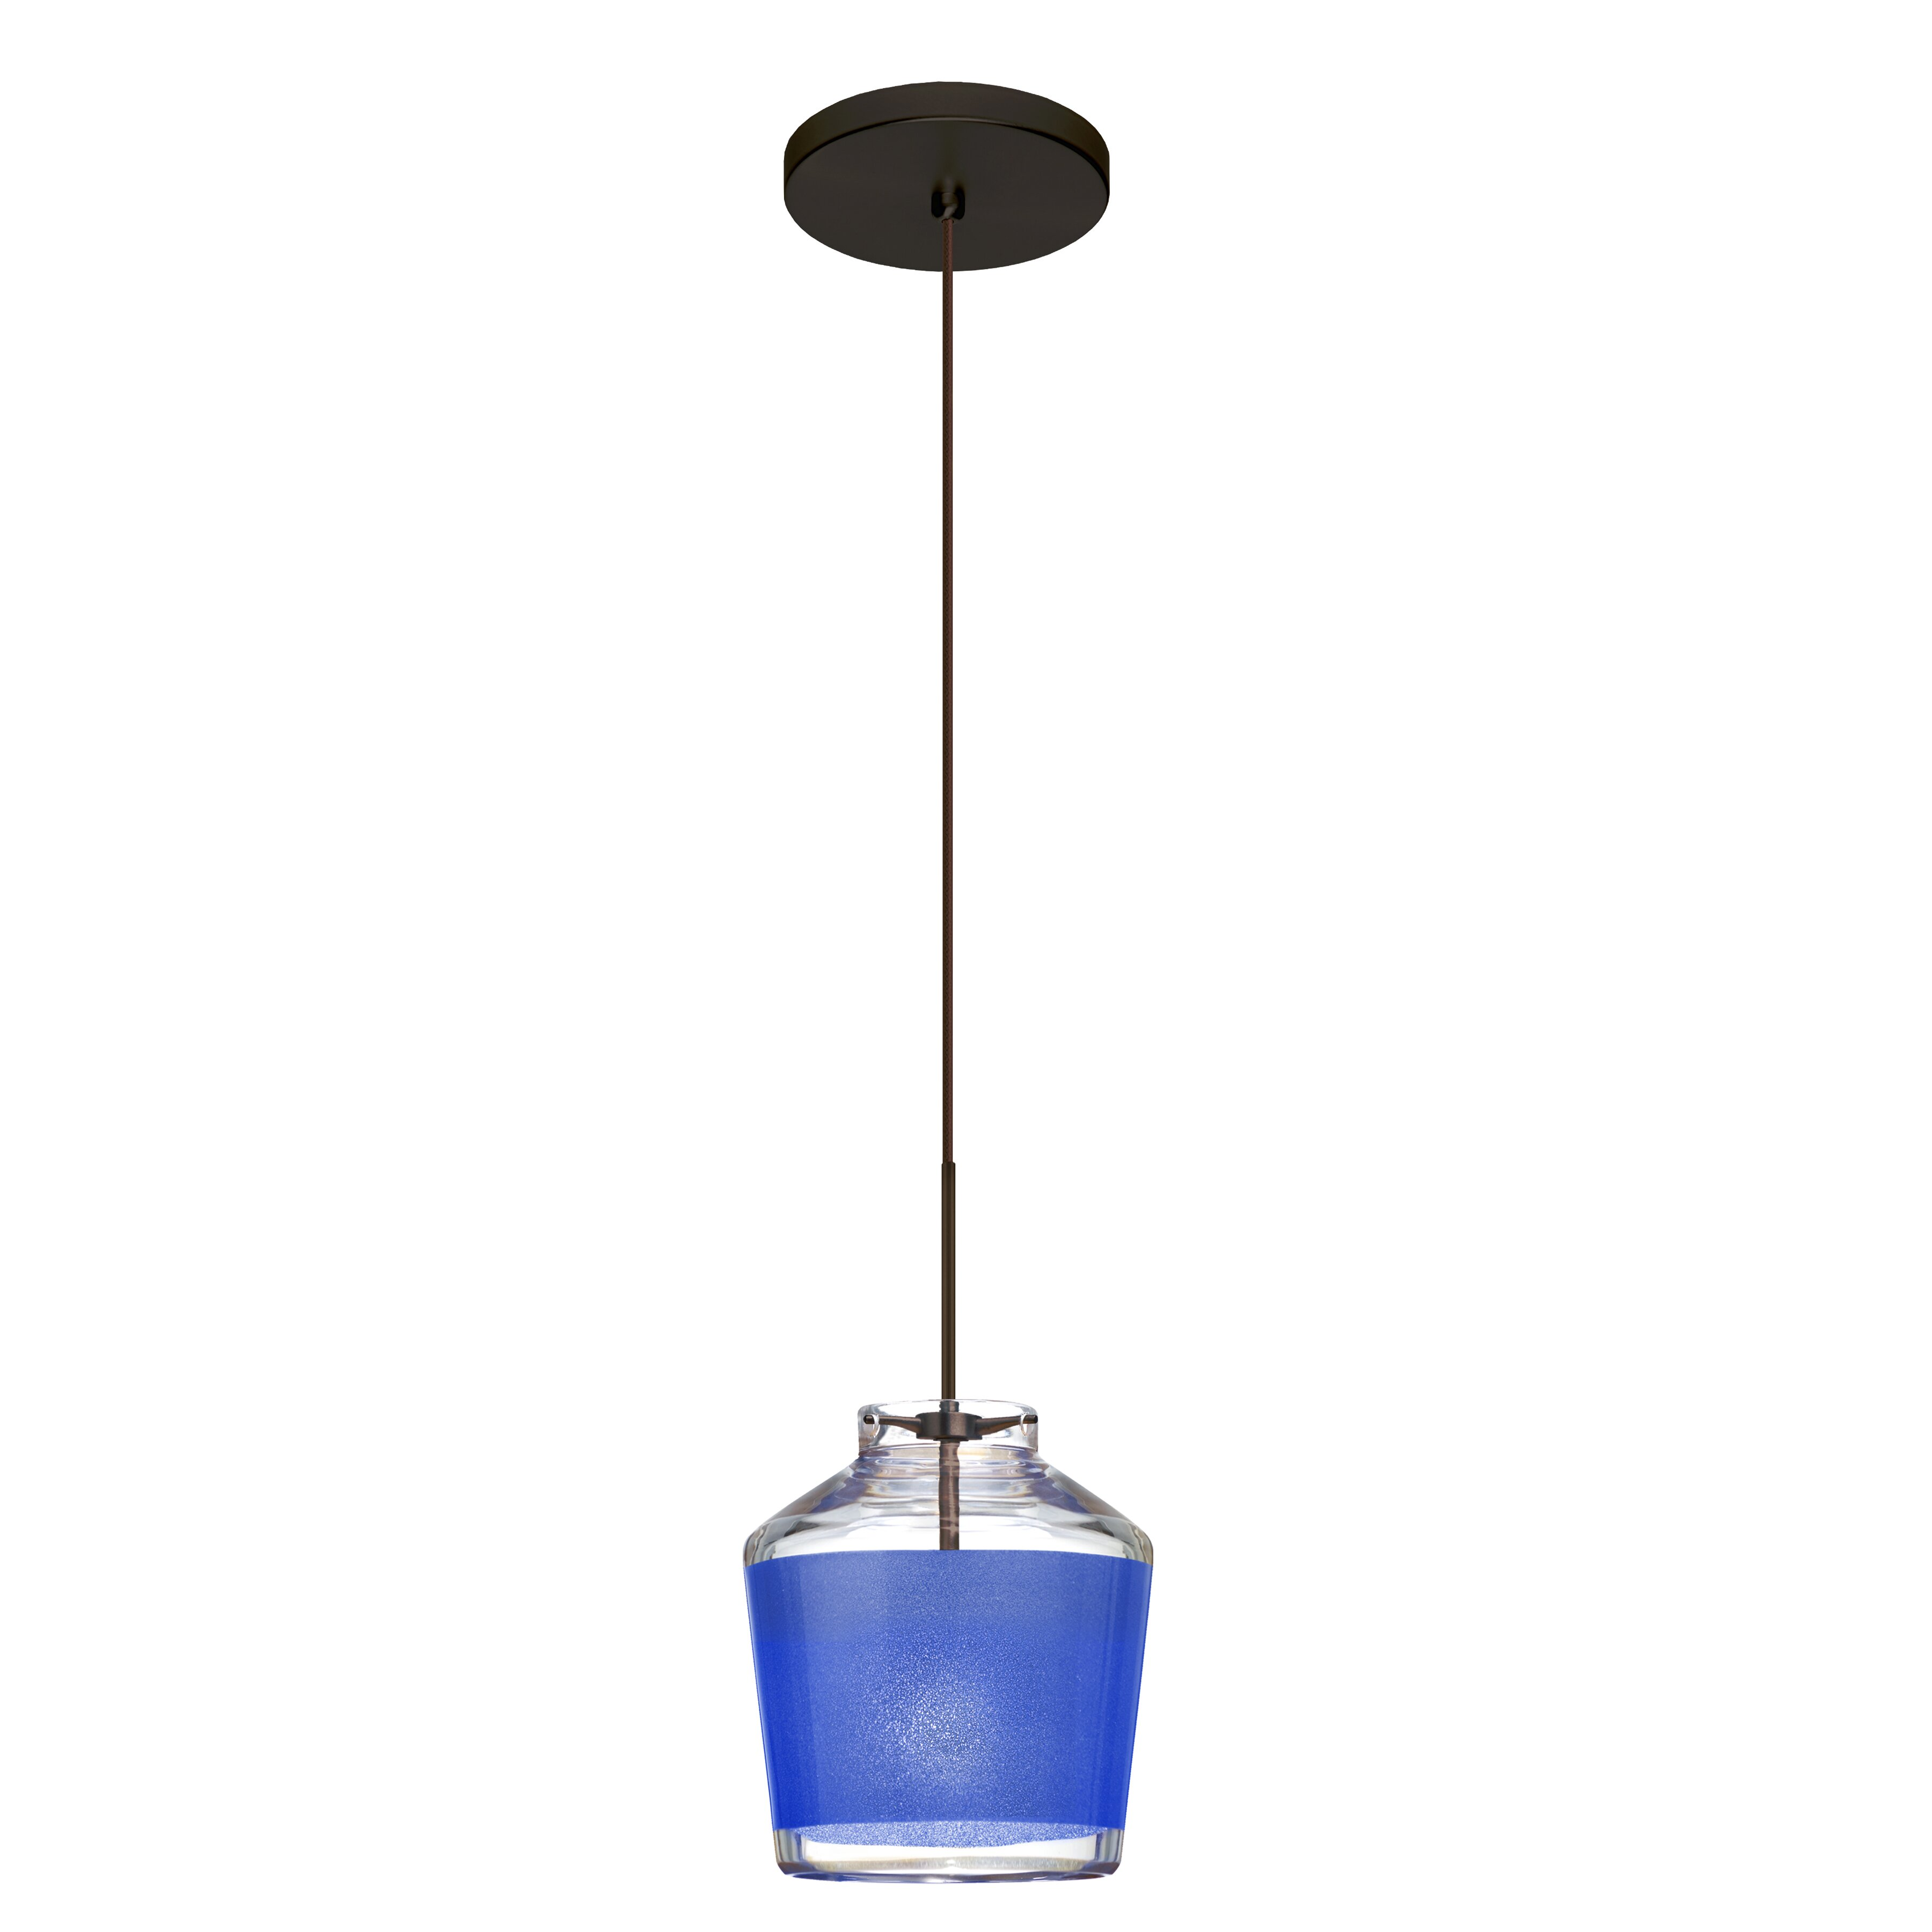 Besa Pendant Lighting Fixtures : Besa lighting pica light mini pendant wayfair